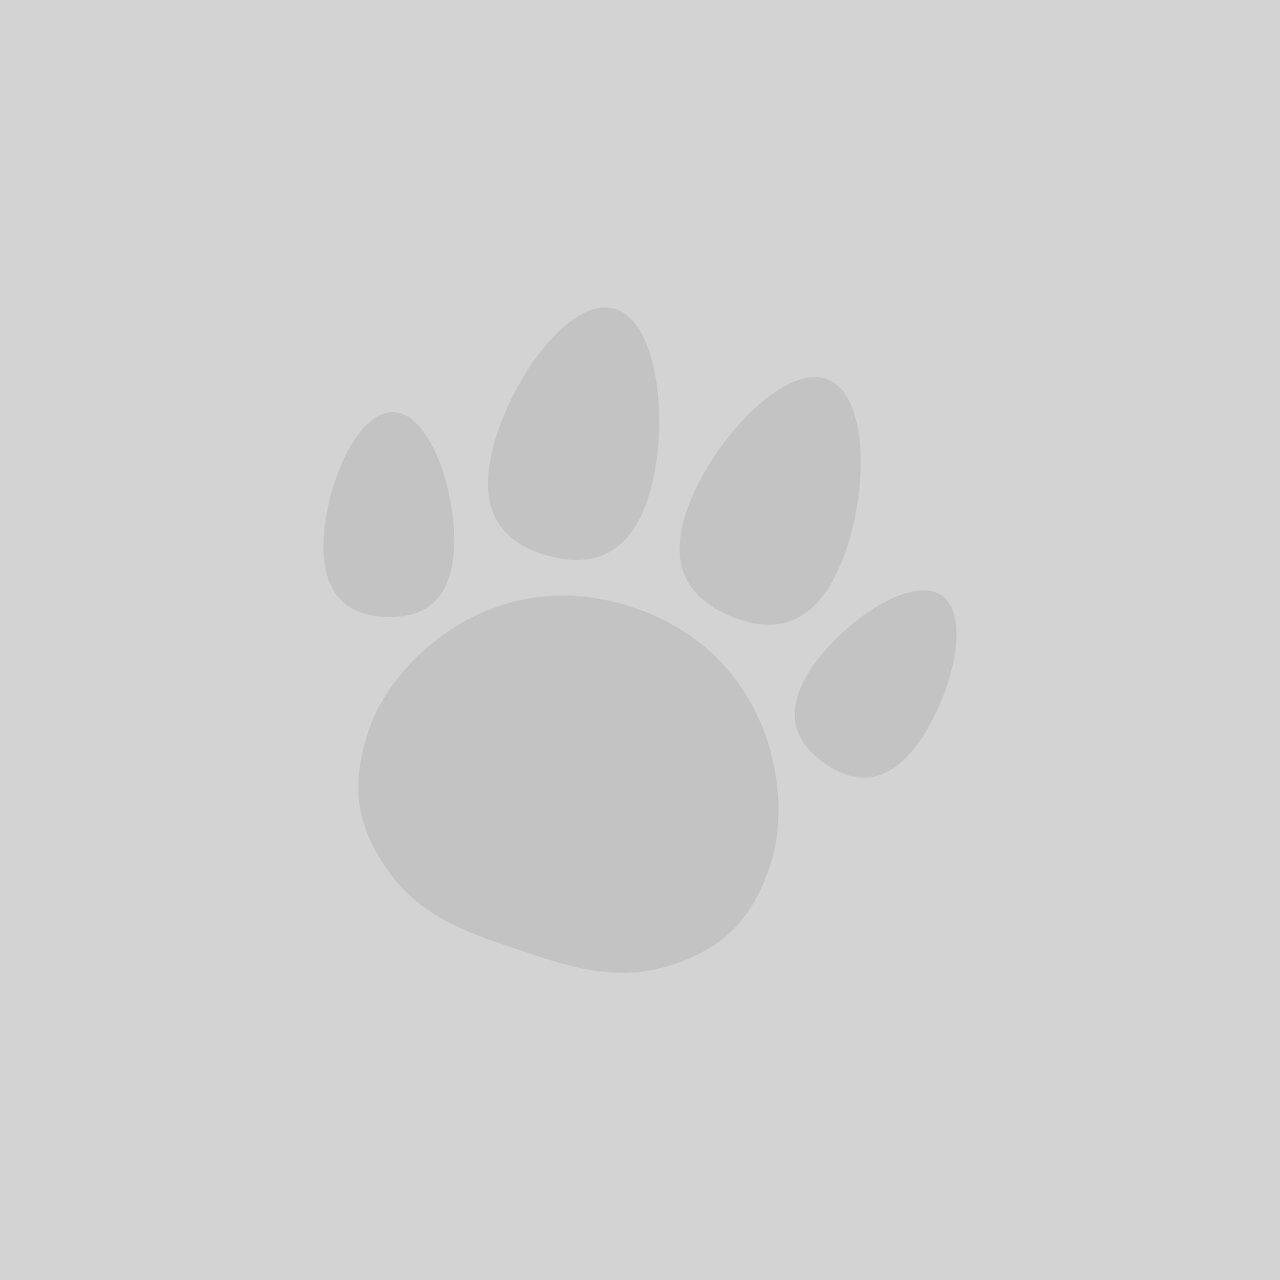 Ancol \'Paw n Bone\' Dog Lead 1mx19mm (2 Colour Options)